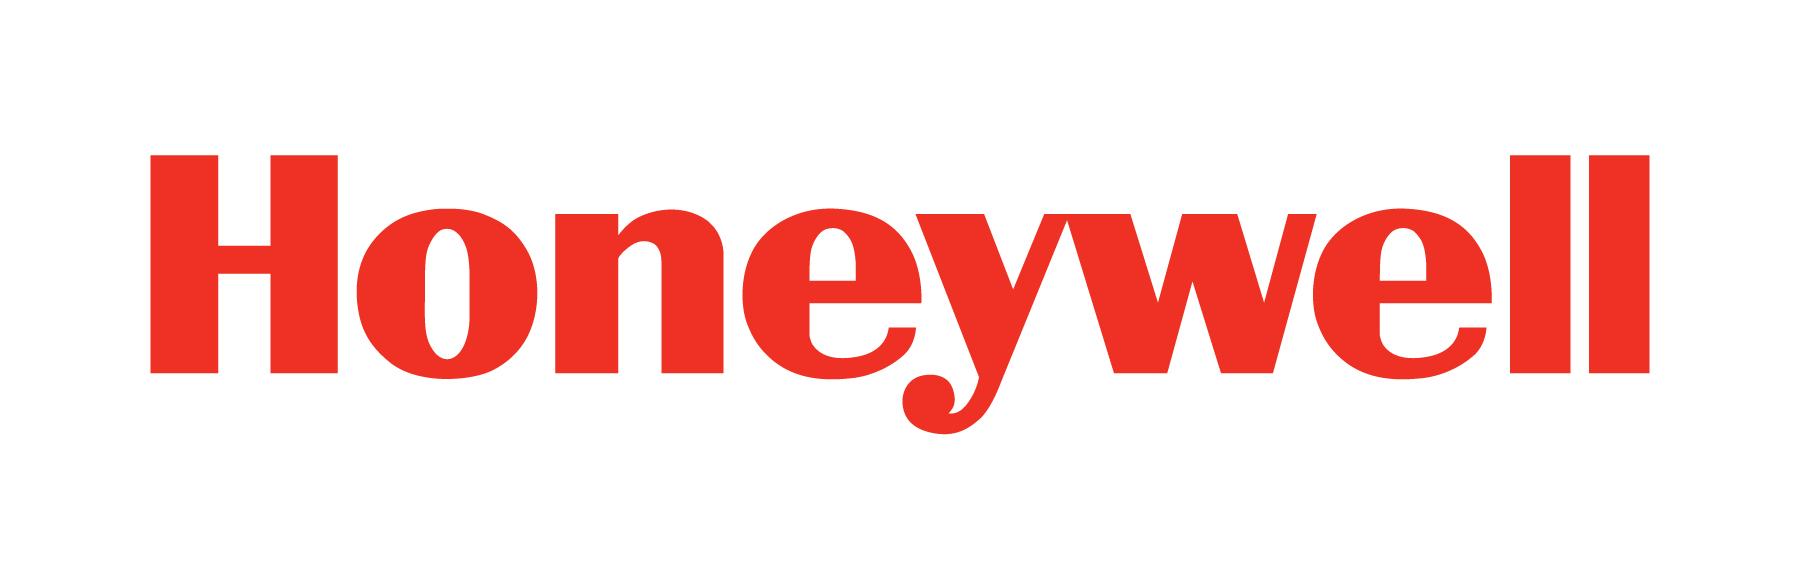 Honeywell Renewables